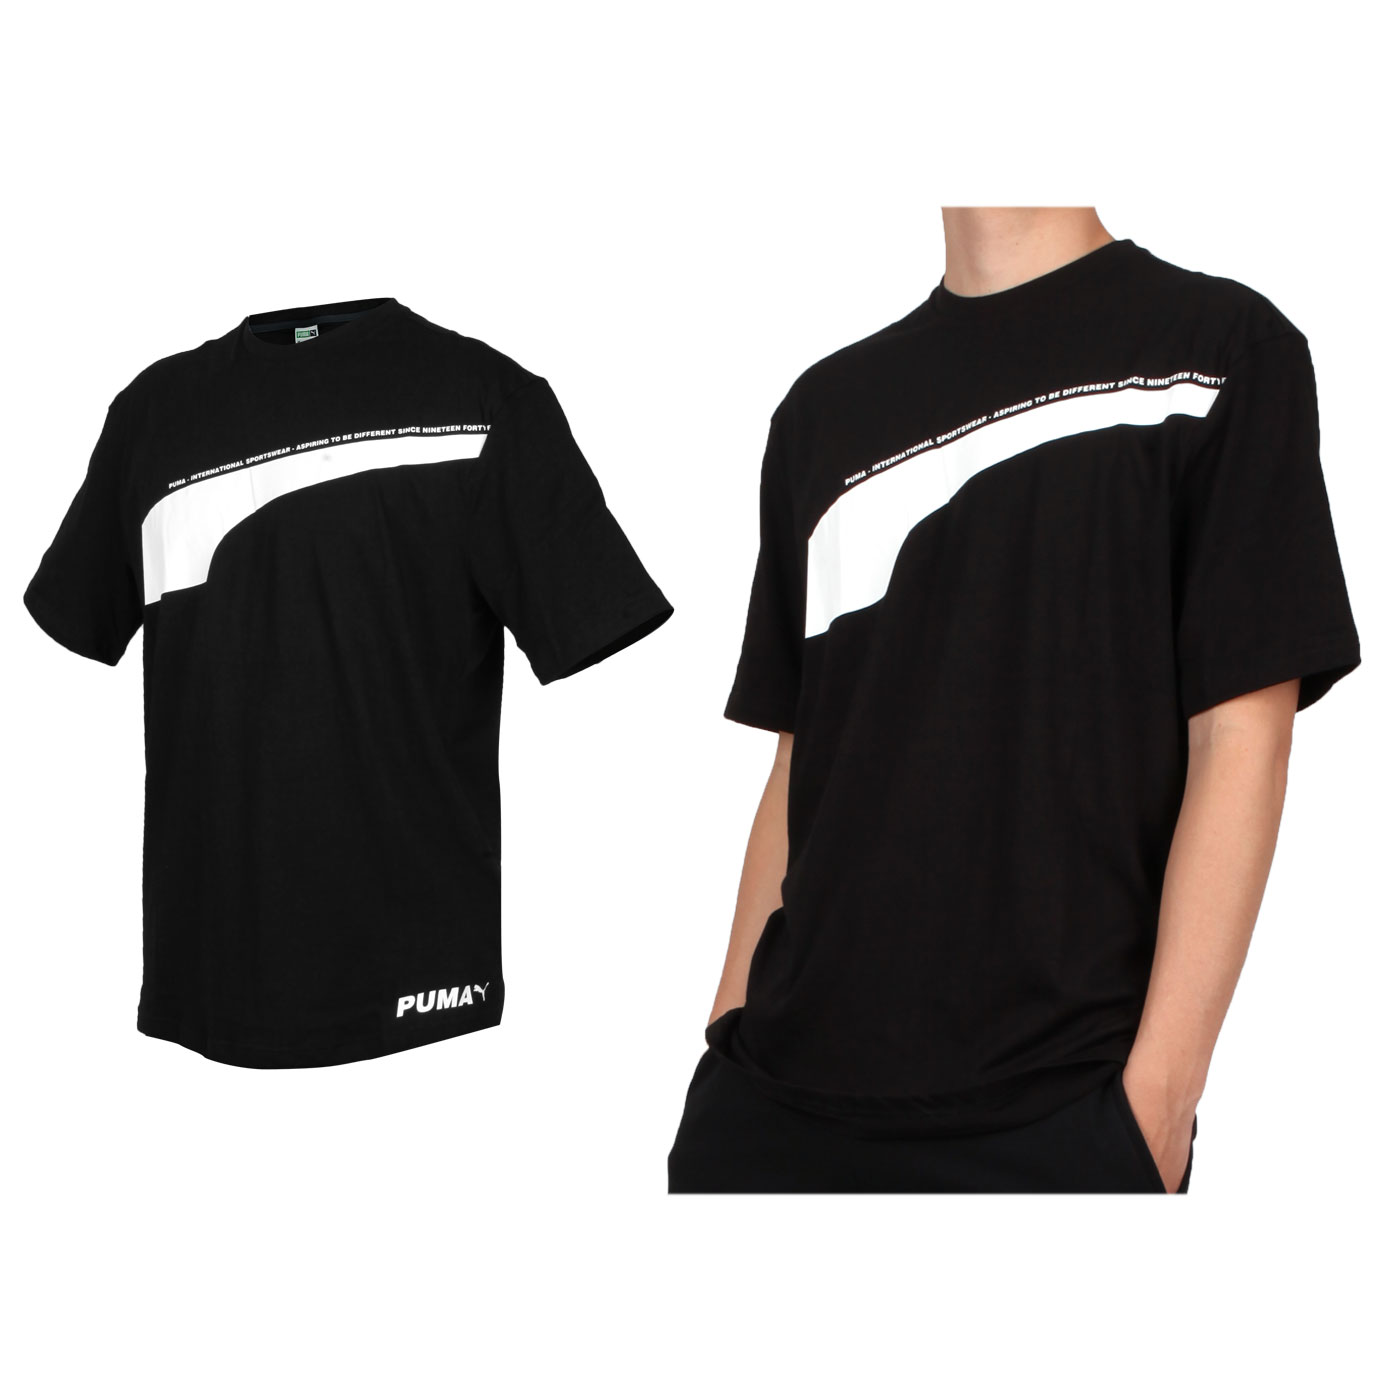 PUMA 男款流行系列Avenir短袖T恤 59645701